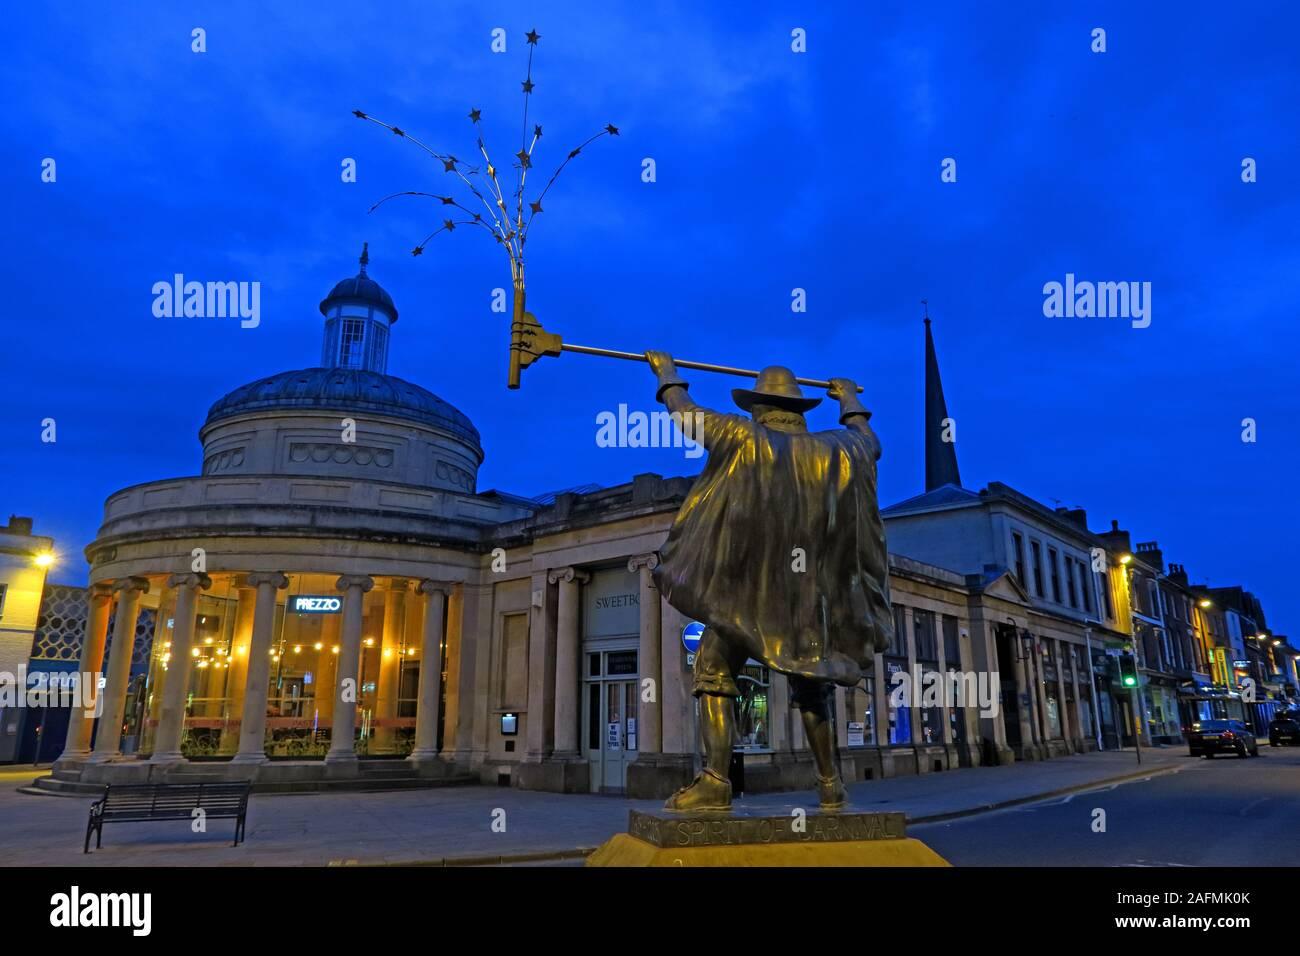 HotpixUK,@HotpixUK,GoTonySmith,Somerset,SDC,Sedgemoor,Sedgemoor District Council,South West England,England,UK,South West,town,TA6,The Spirit of Carnival,art,artwork,Spirit of Carnival statue Bridgwater,sculptor David Faulks,sculptor,David Faulks,2005,Bridgwater Guy Fawkes Carnival,Bridgwater Carnival,400th anniversary,Gunpowder Plot,parliament,lighted Bridgwater squib,squib cosh,blow up the Houses of Parliament,blow up,the Houses of Parliament,TA6 3BY,Gunpowder Plotter Guy Fawkes,Gunpowder plot,Plotter,Guy Fawkes,Bridgwater,dusk,night,night time